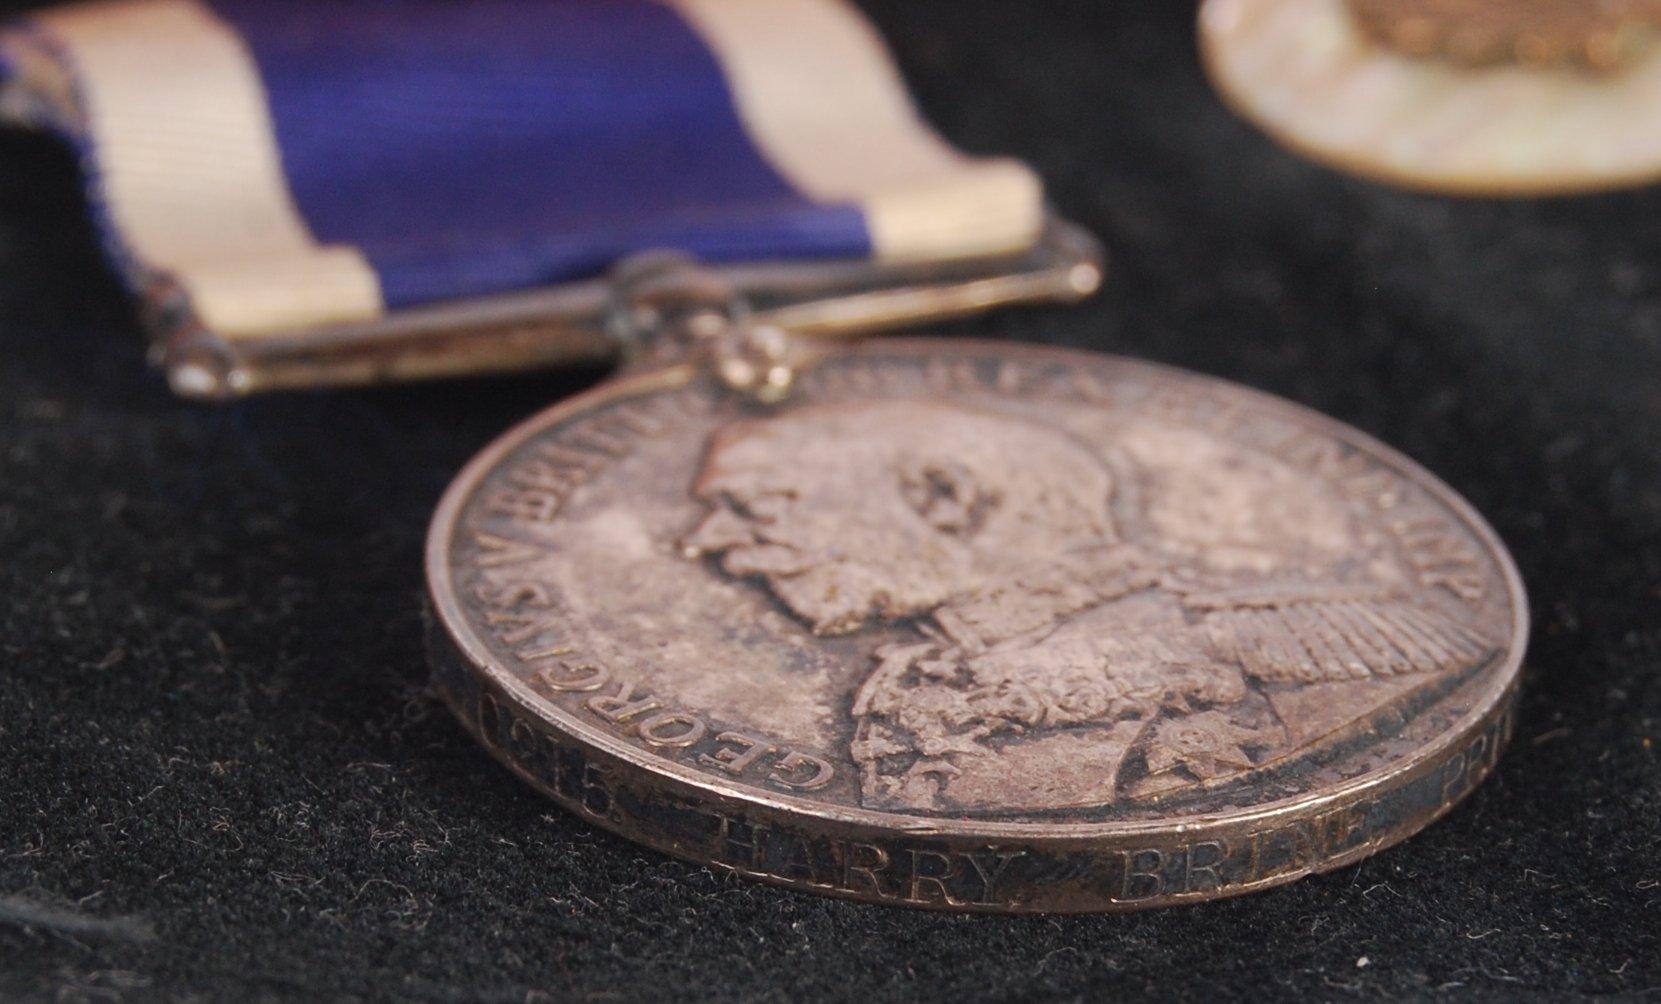 WWI FIRST WORLD WAR MEDAL PAIR & BADGE - ROYAL MAR - Image 3 of 4